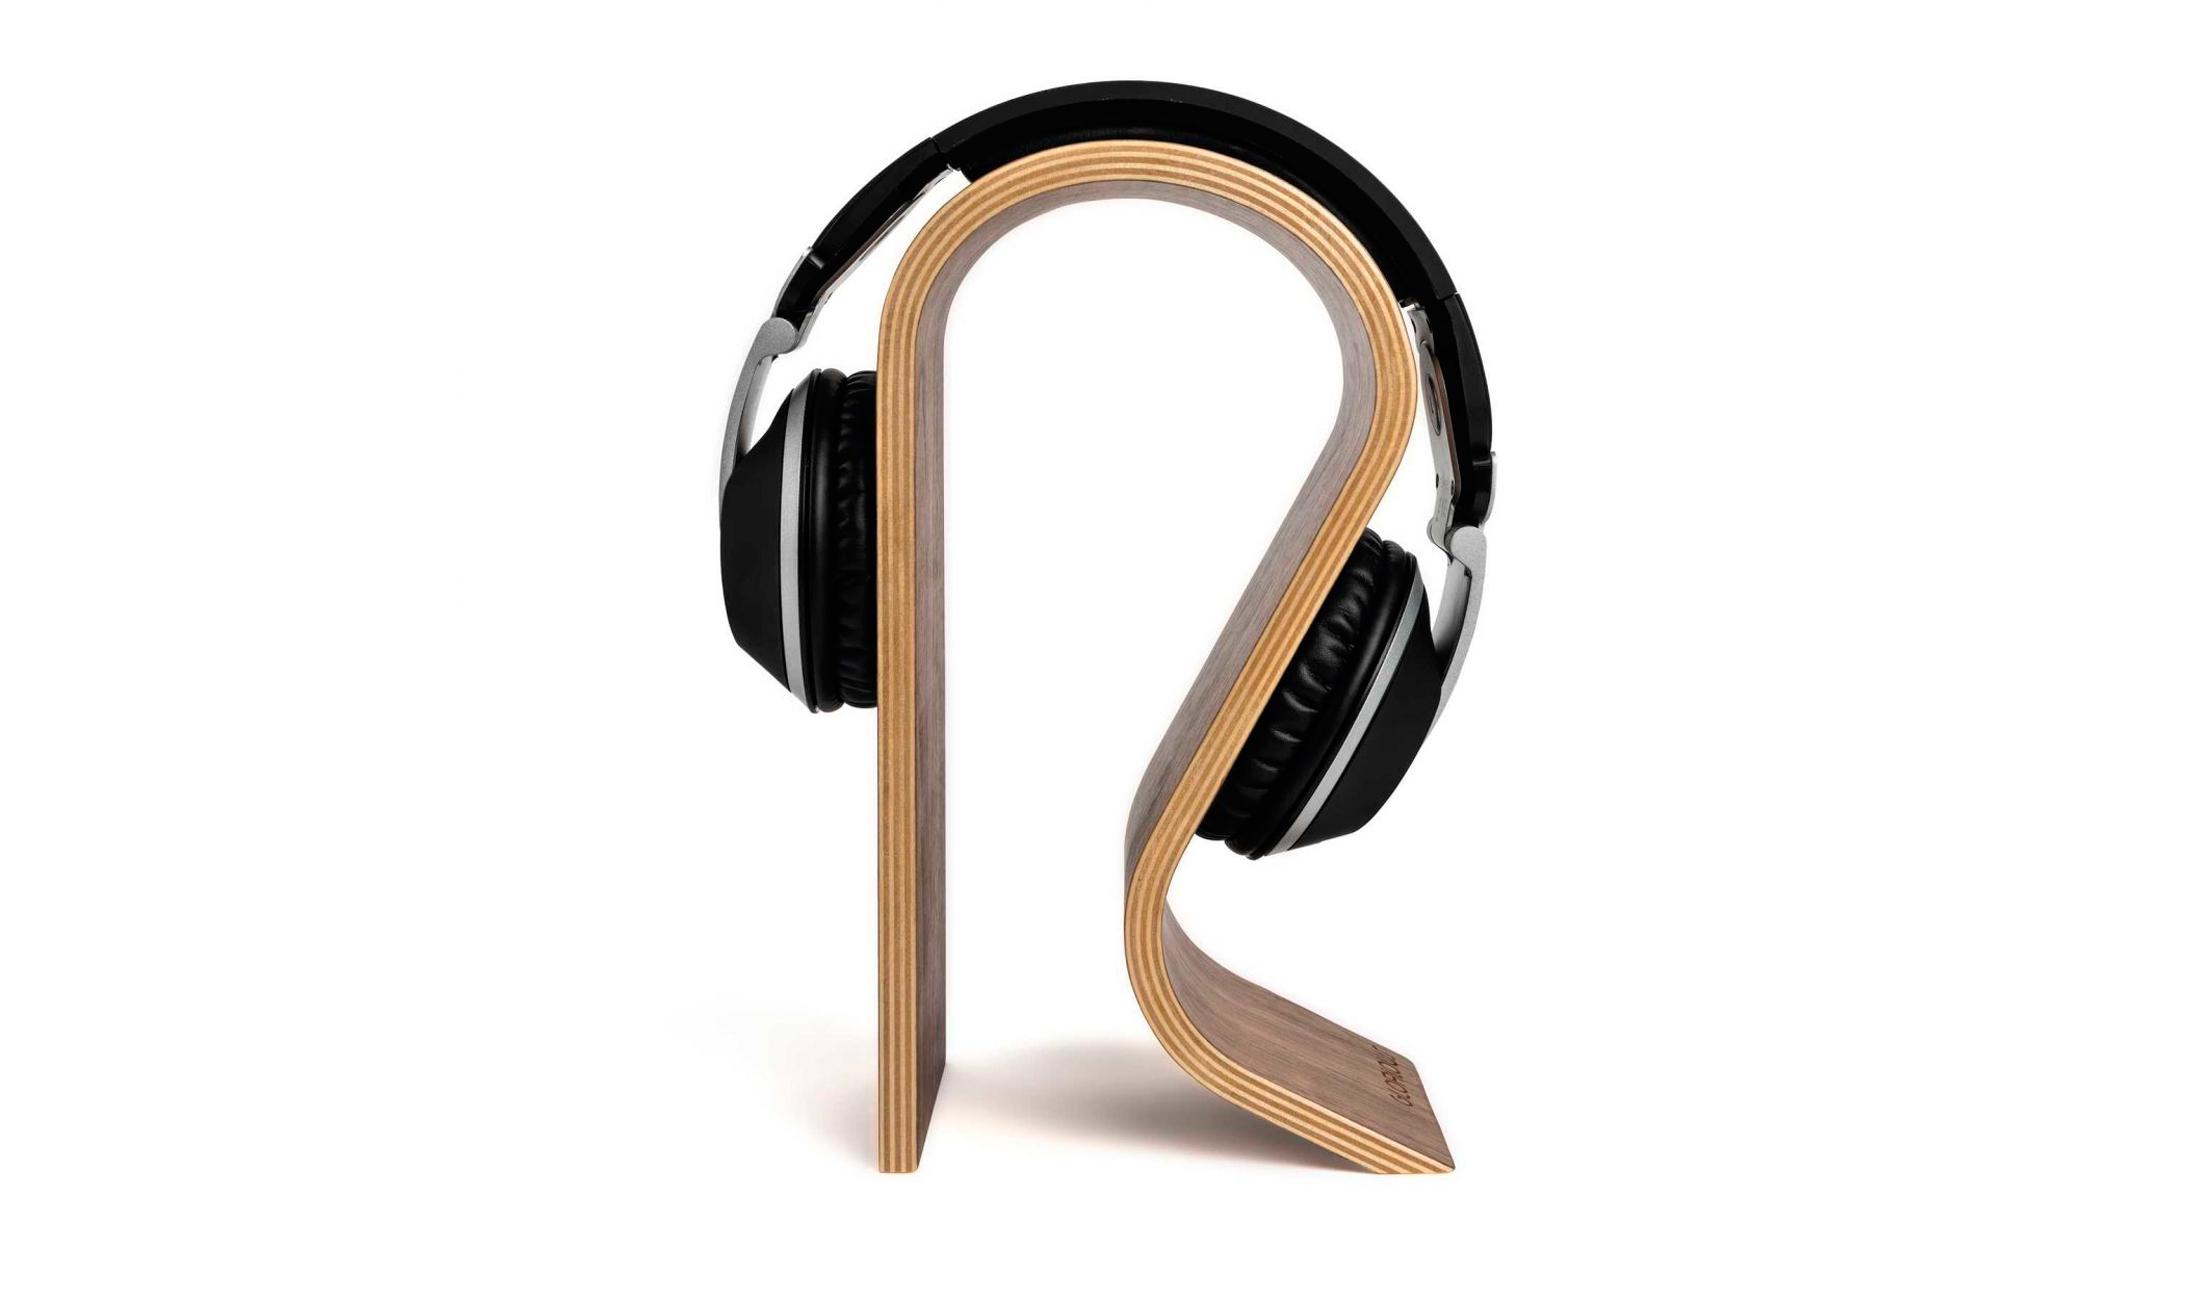 Das Auge hört mit: Glorious Headphones Stand